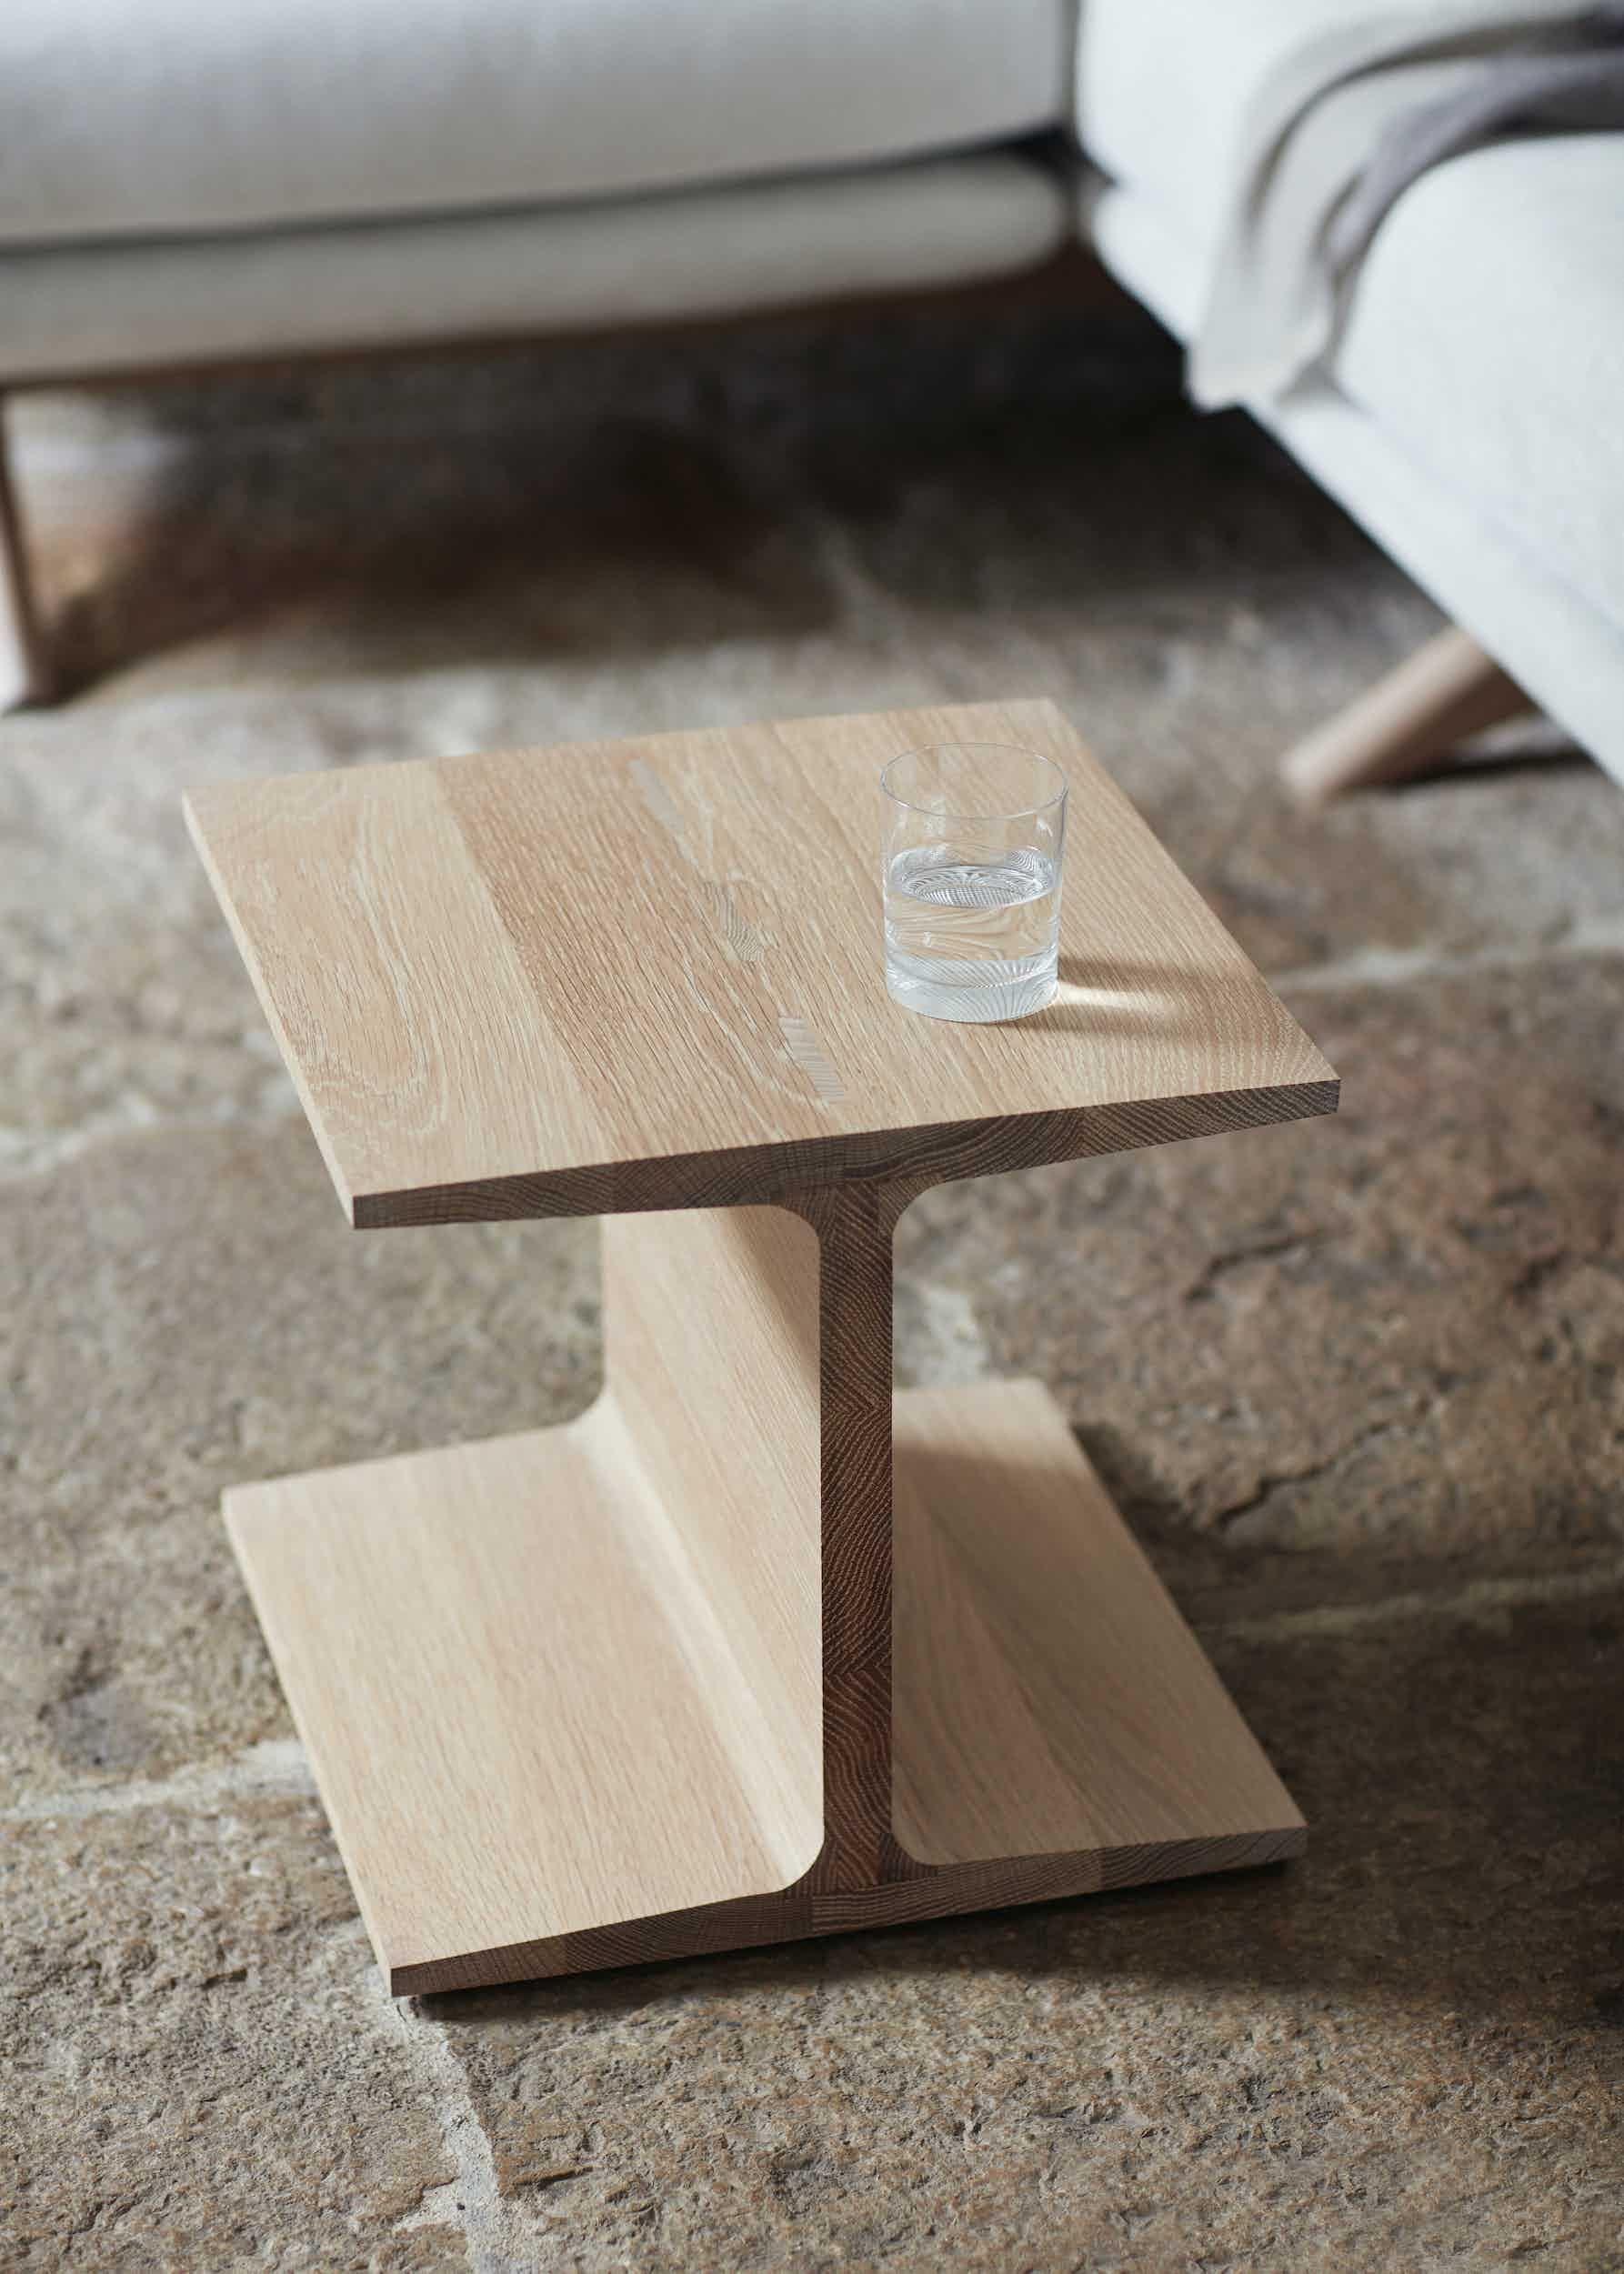 De La Espada Matthew Hilton I Beam Side Table Insitu 2 Haute Living